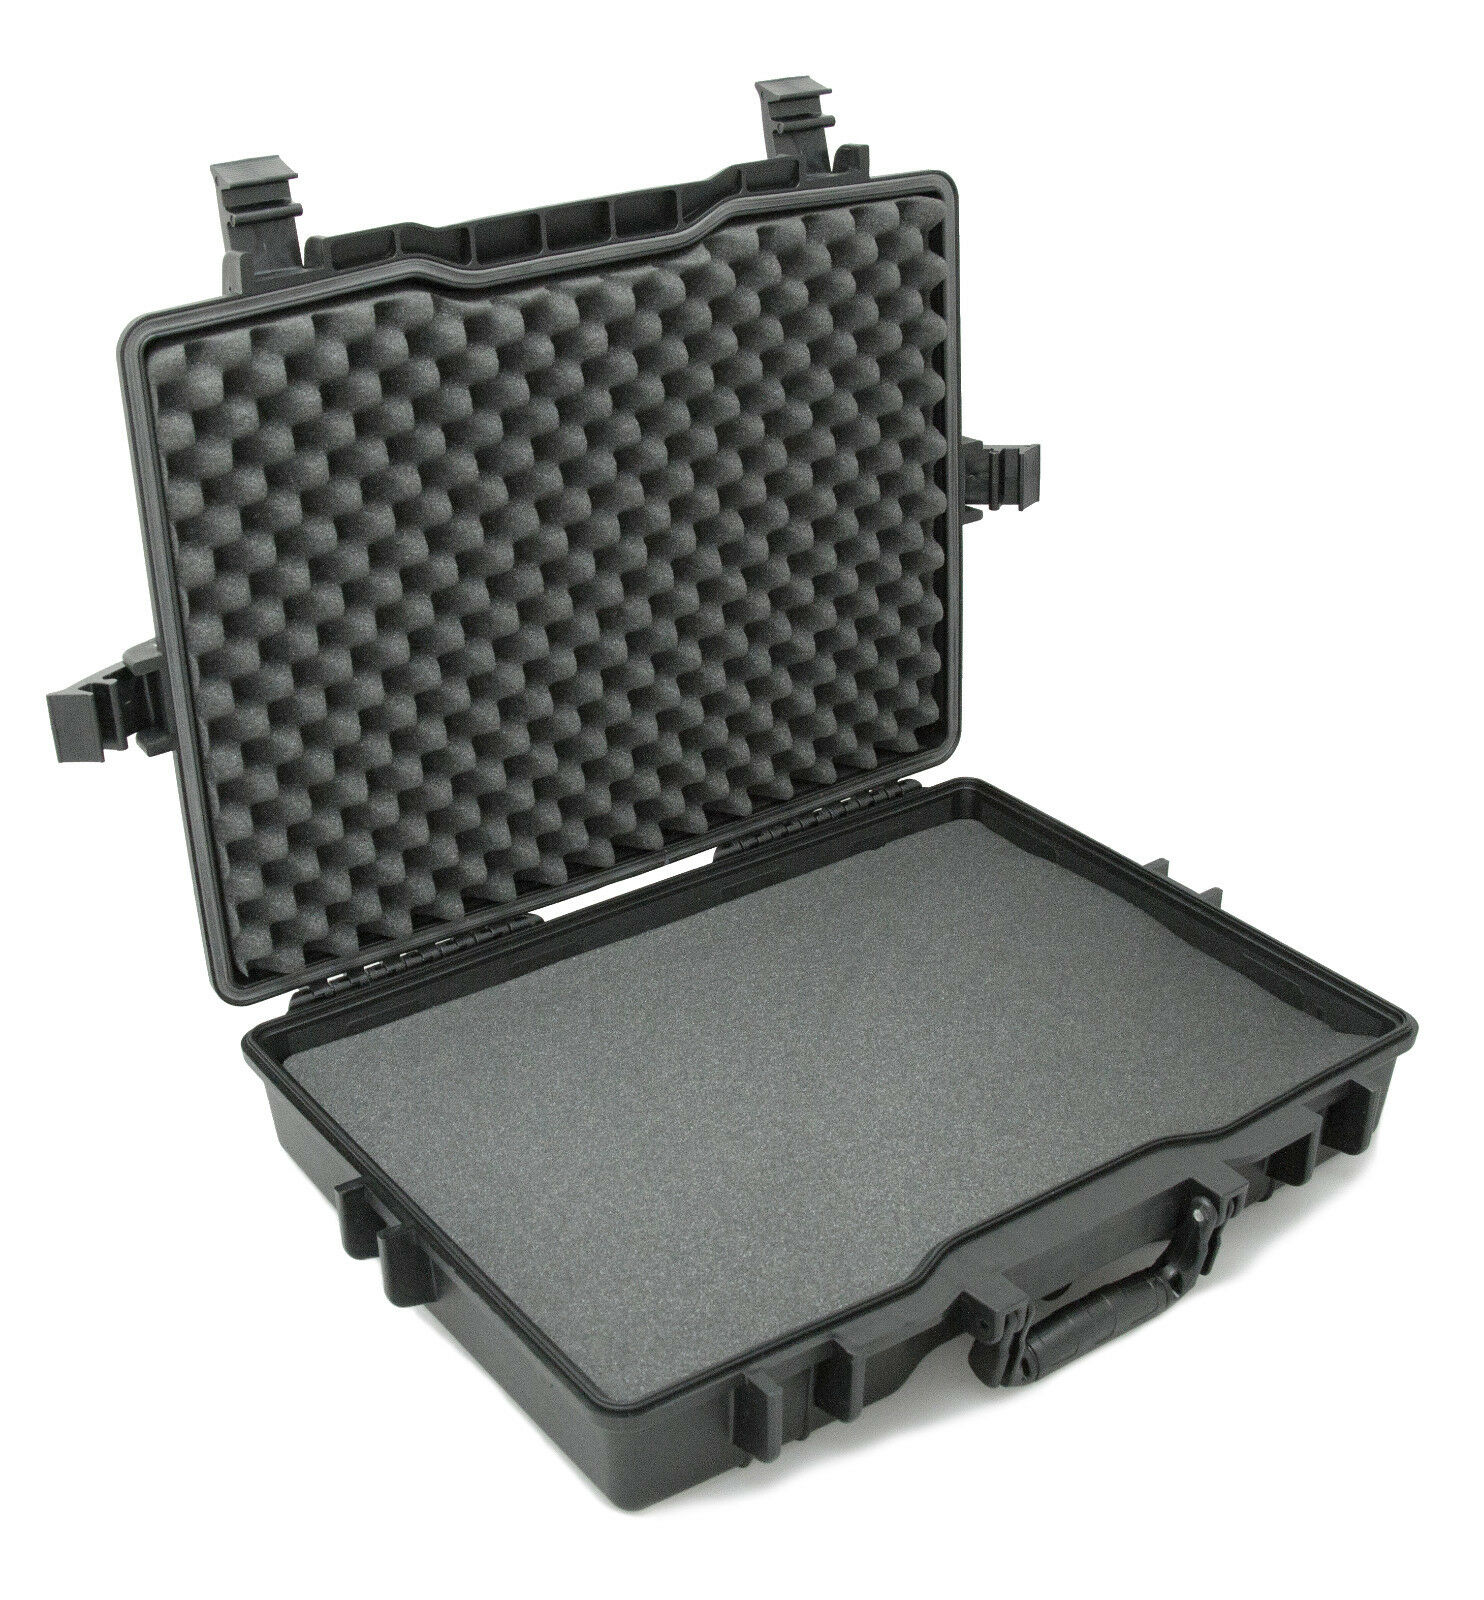 CASEMATIX Elite Gaming Laptop Case Ultimate Protection for T